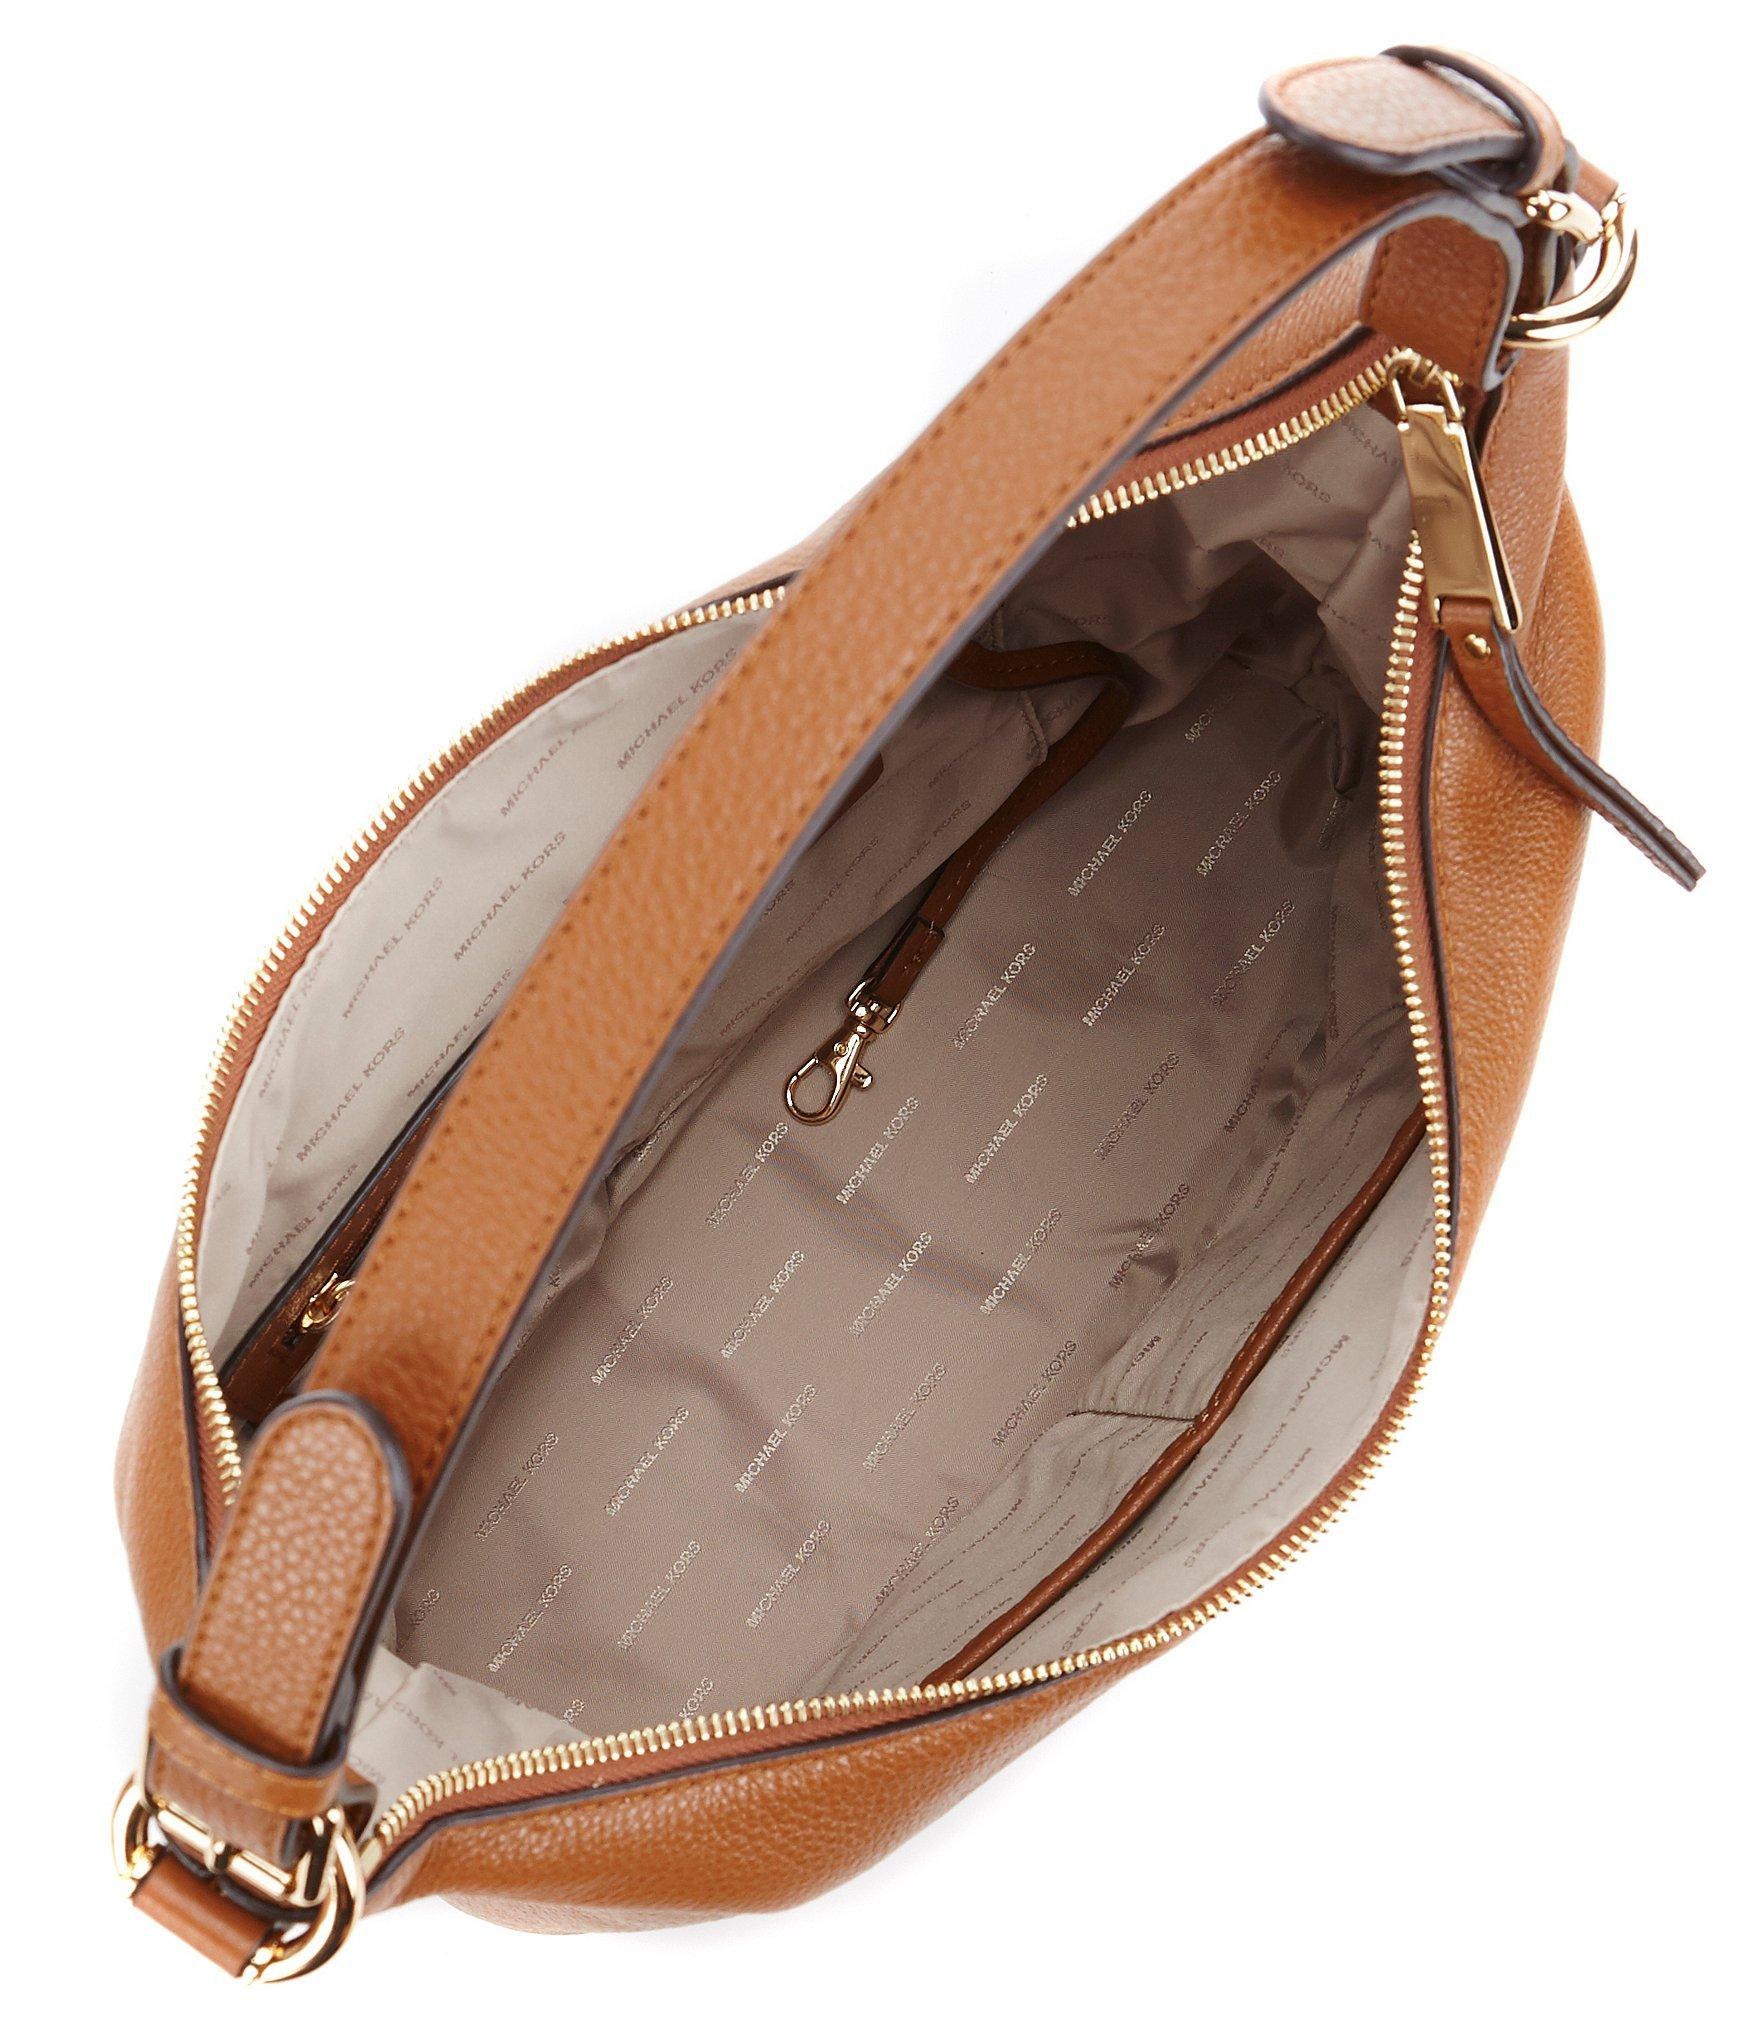 Lyst - MICHAEL Michael Kors Lupita Large Hobo Bag in Brown 6ce20348f7